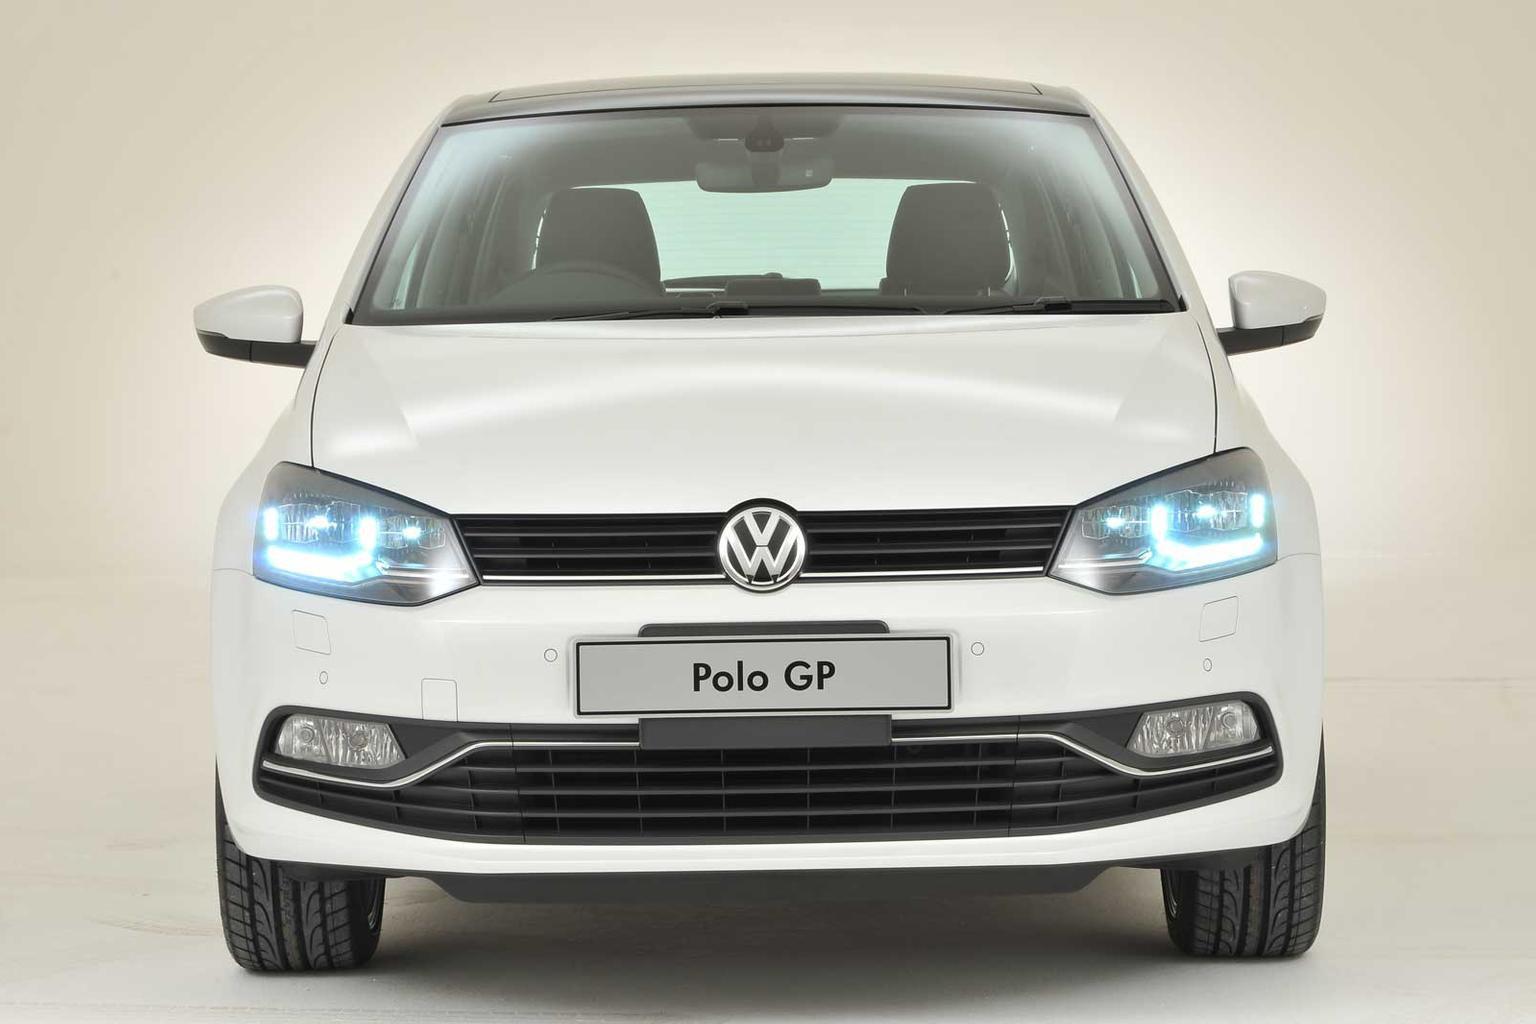 Plug-in hybrid Volkswagen Polo confirmed